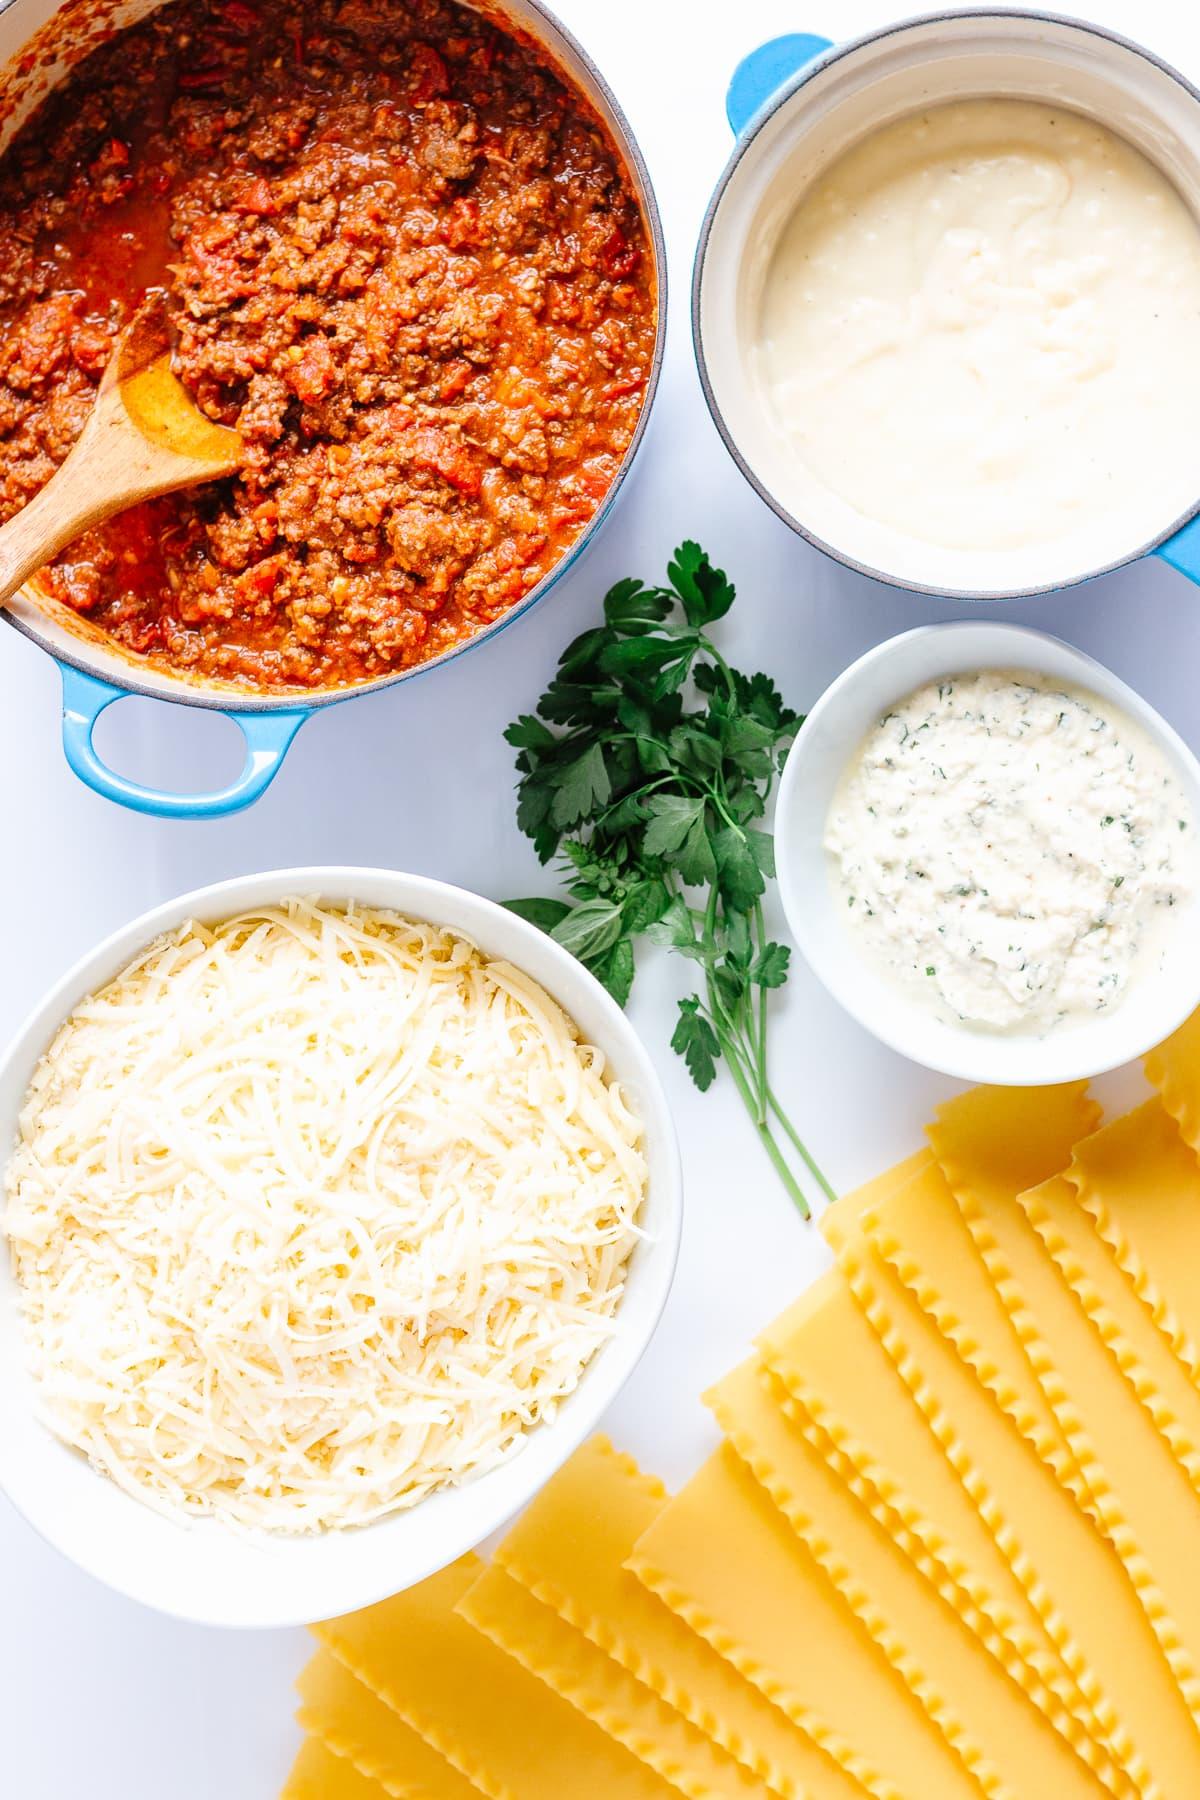 Ingredients needed to make lasagna